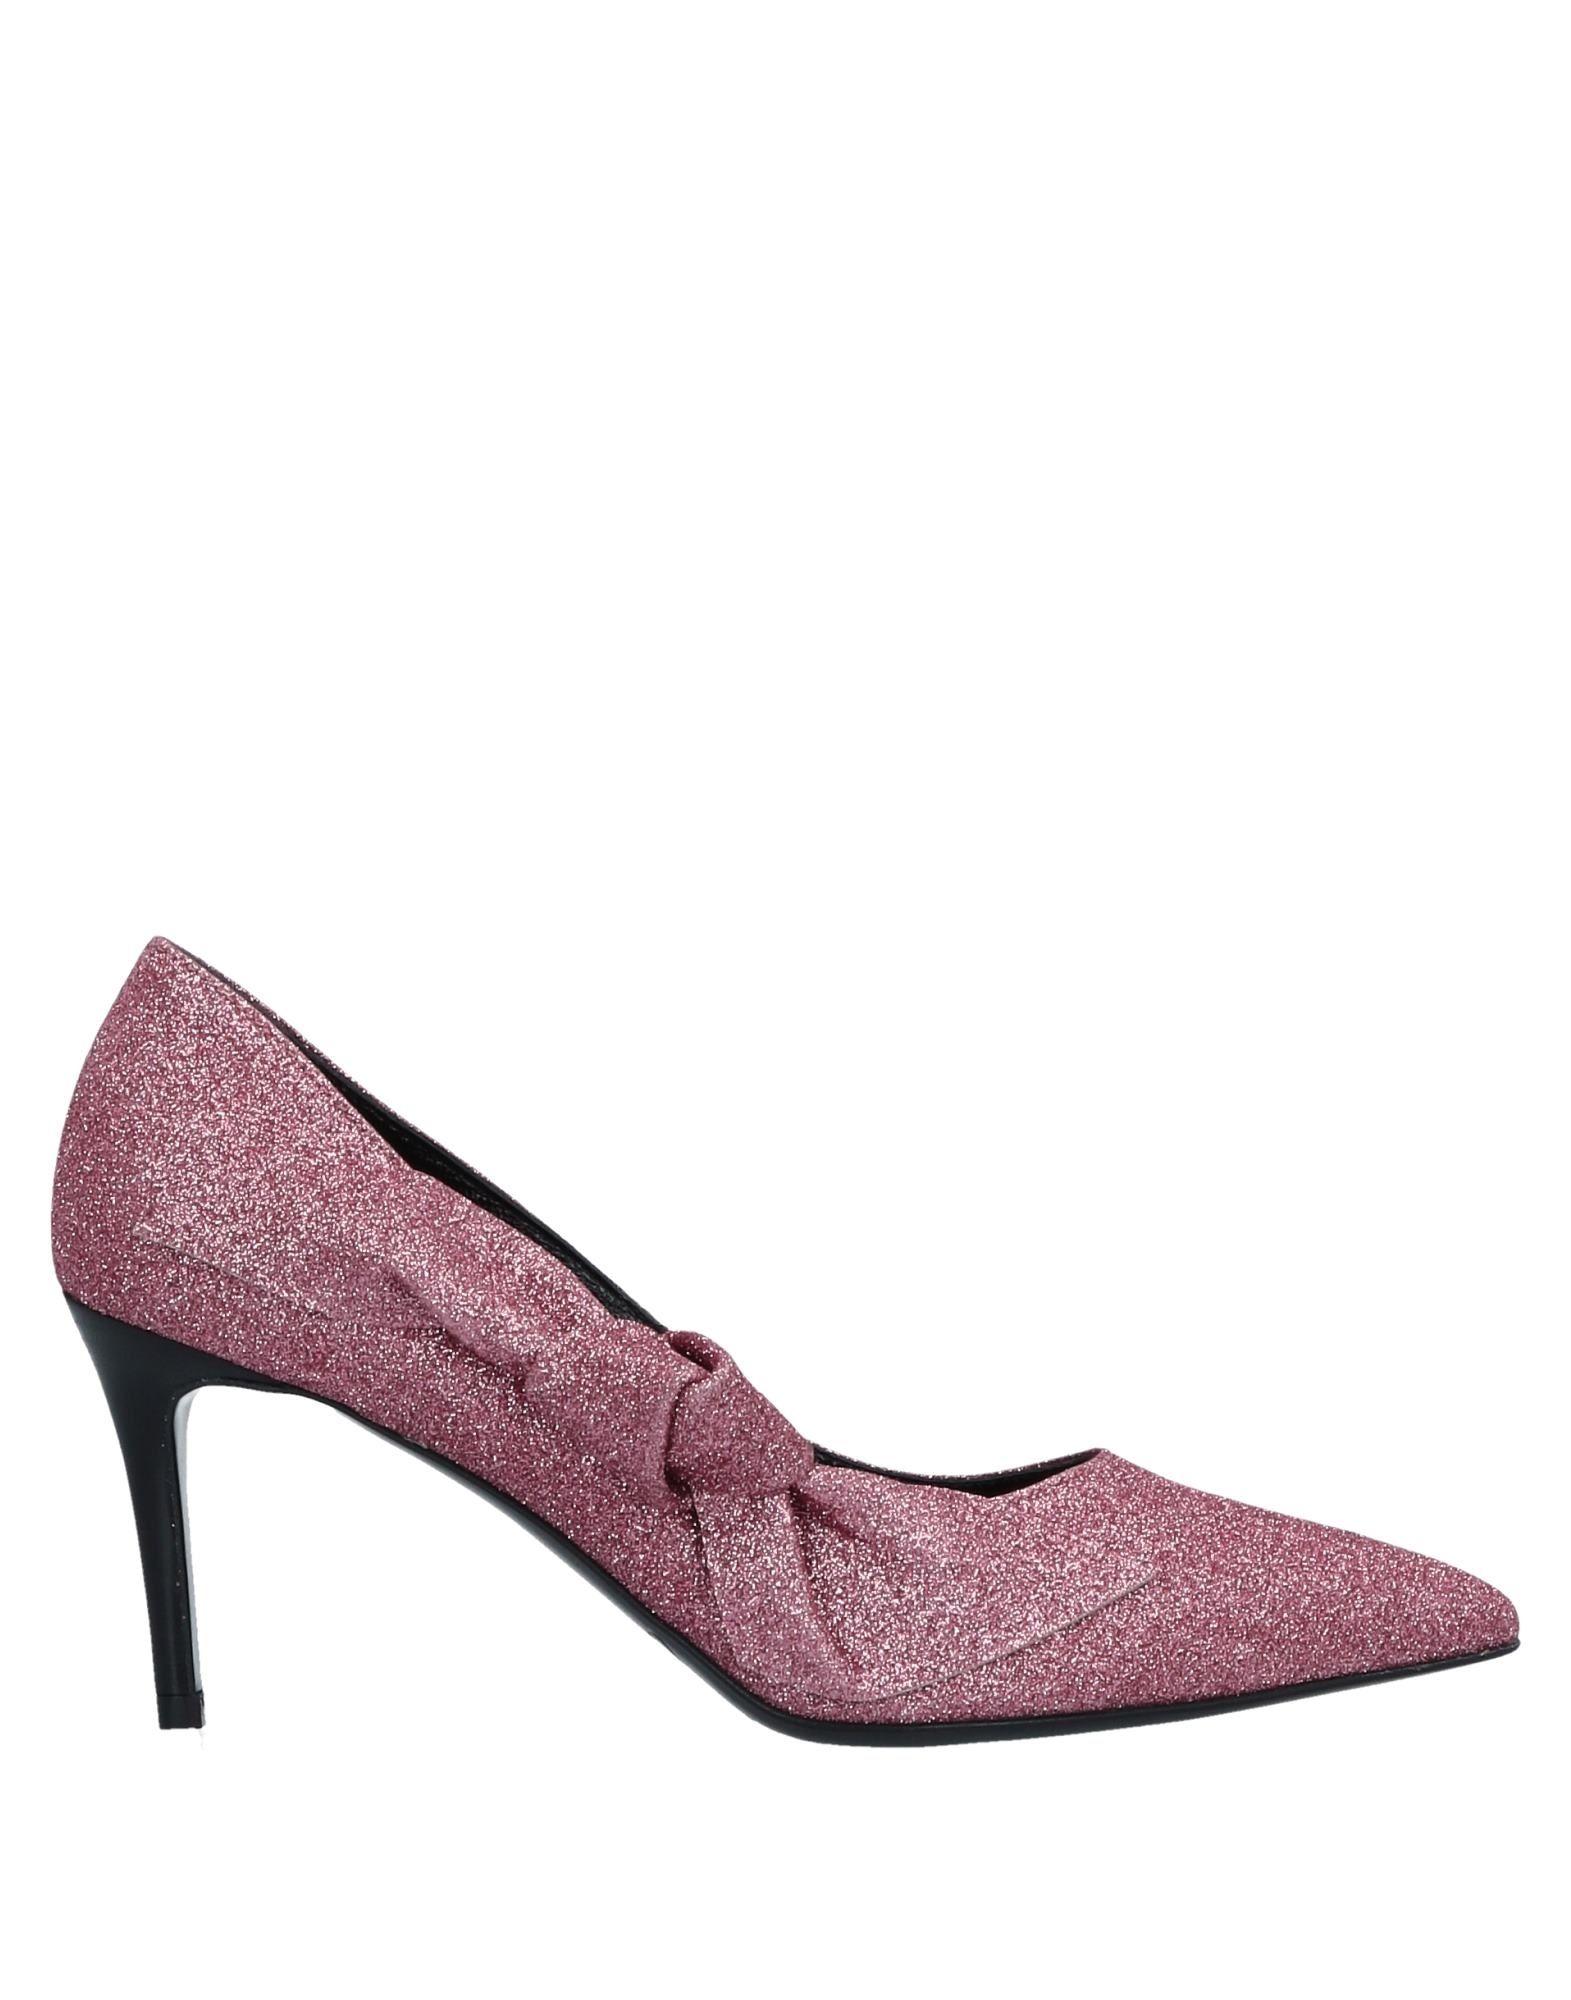 Stilvolle billige Schuhe Damen Carla G. Pumps Damen Schuhe  11522960SJ df0fda